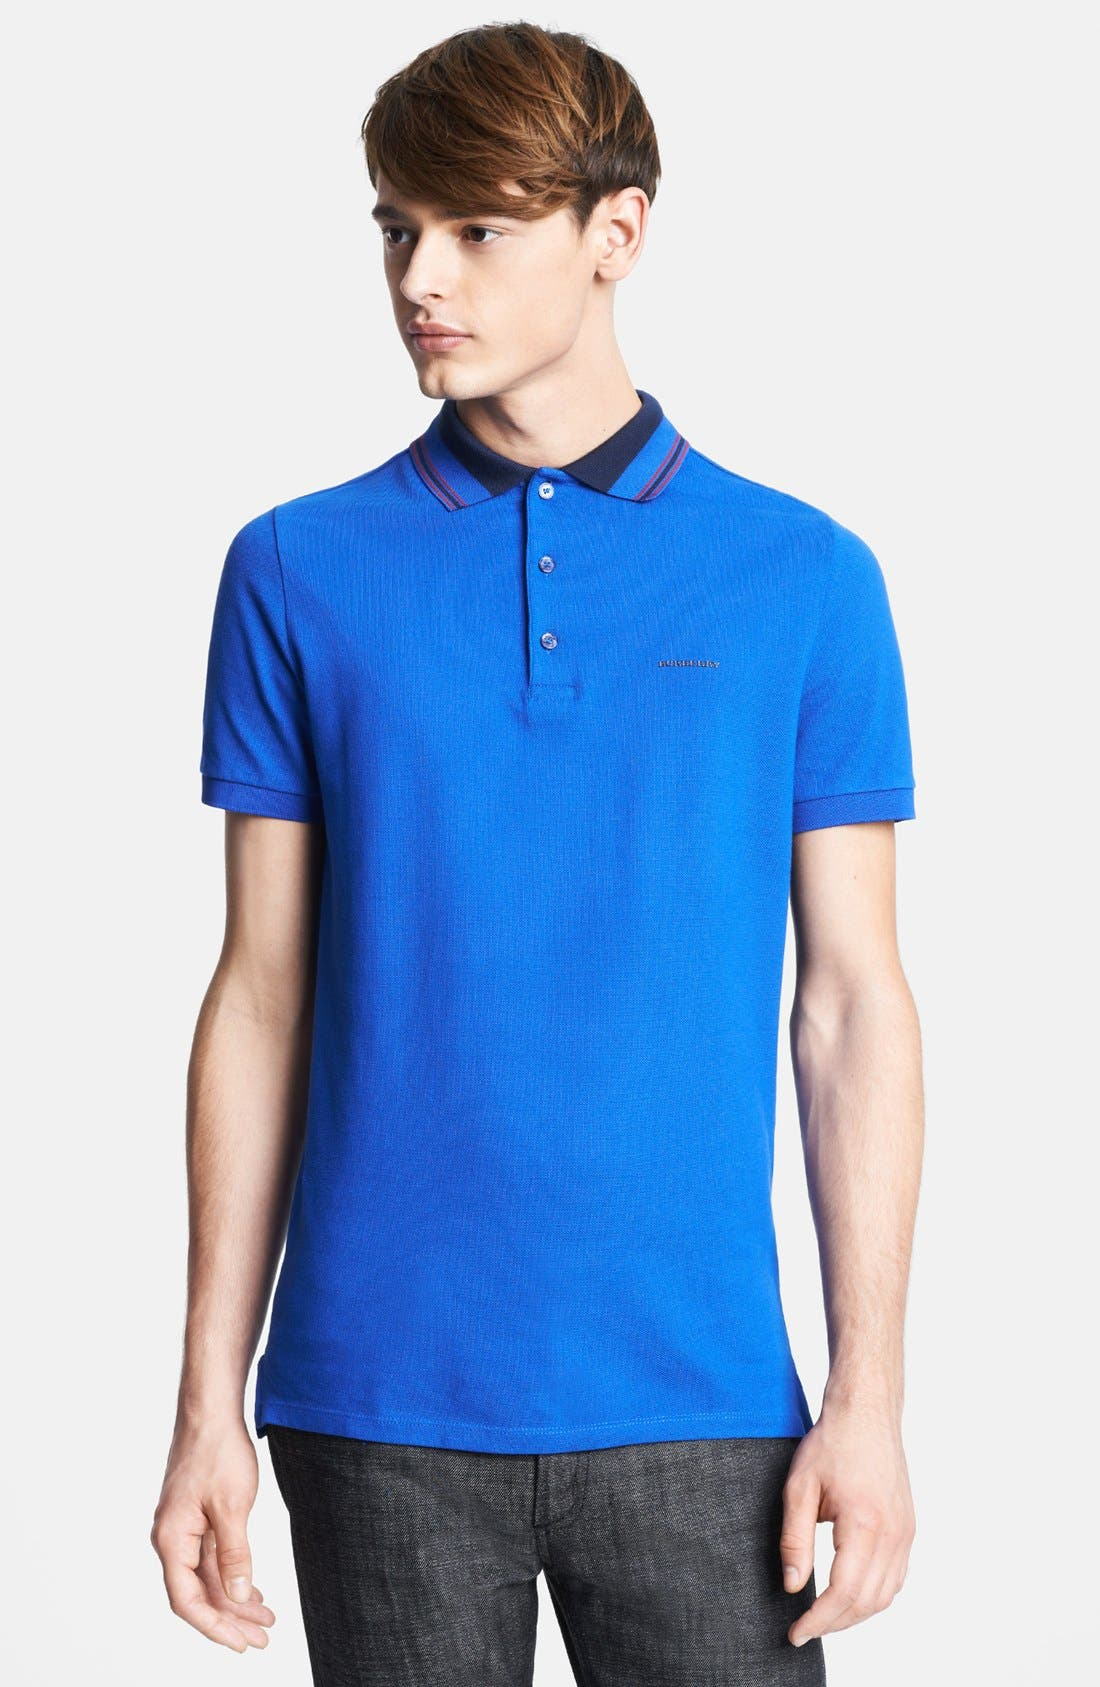 London 'Adler' Check Placket Cotton Polo,                         Main,                         color, Bright Blue